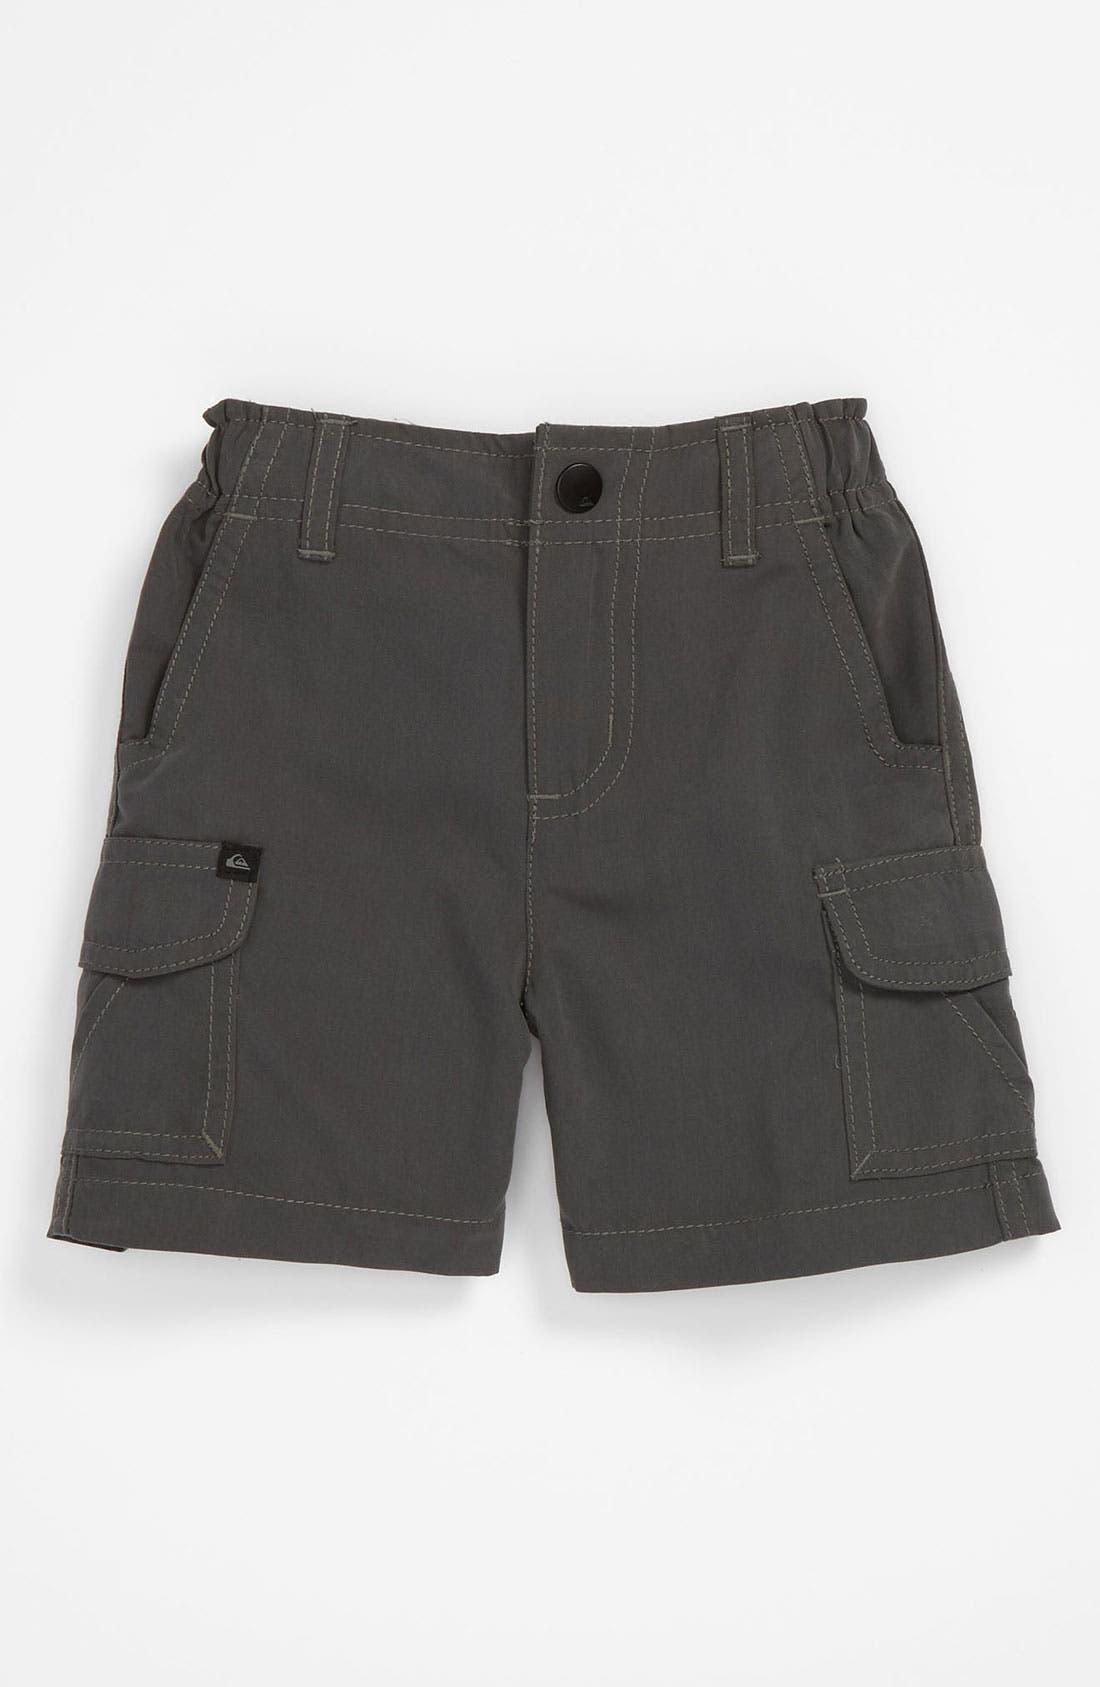 Main Image - Quiksilver 'Phofilled' Shorts (Toddler)